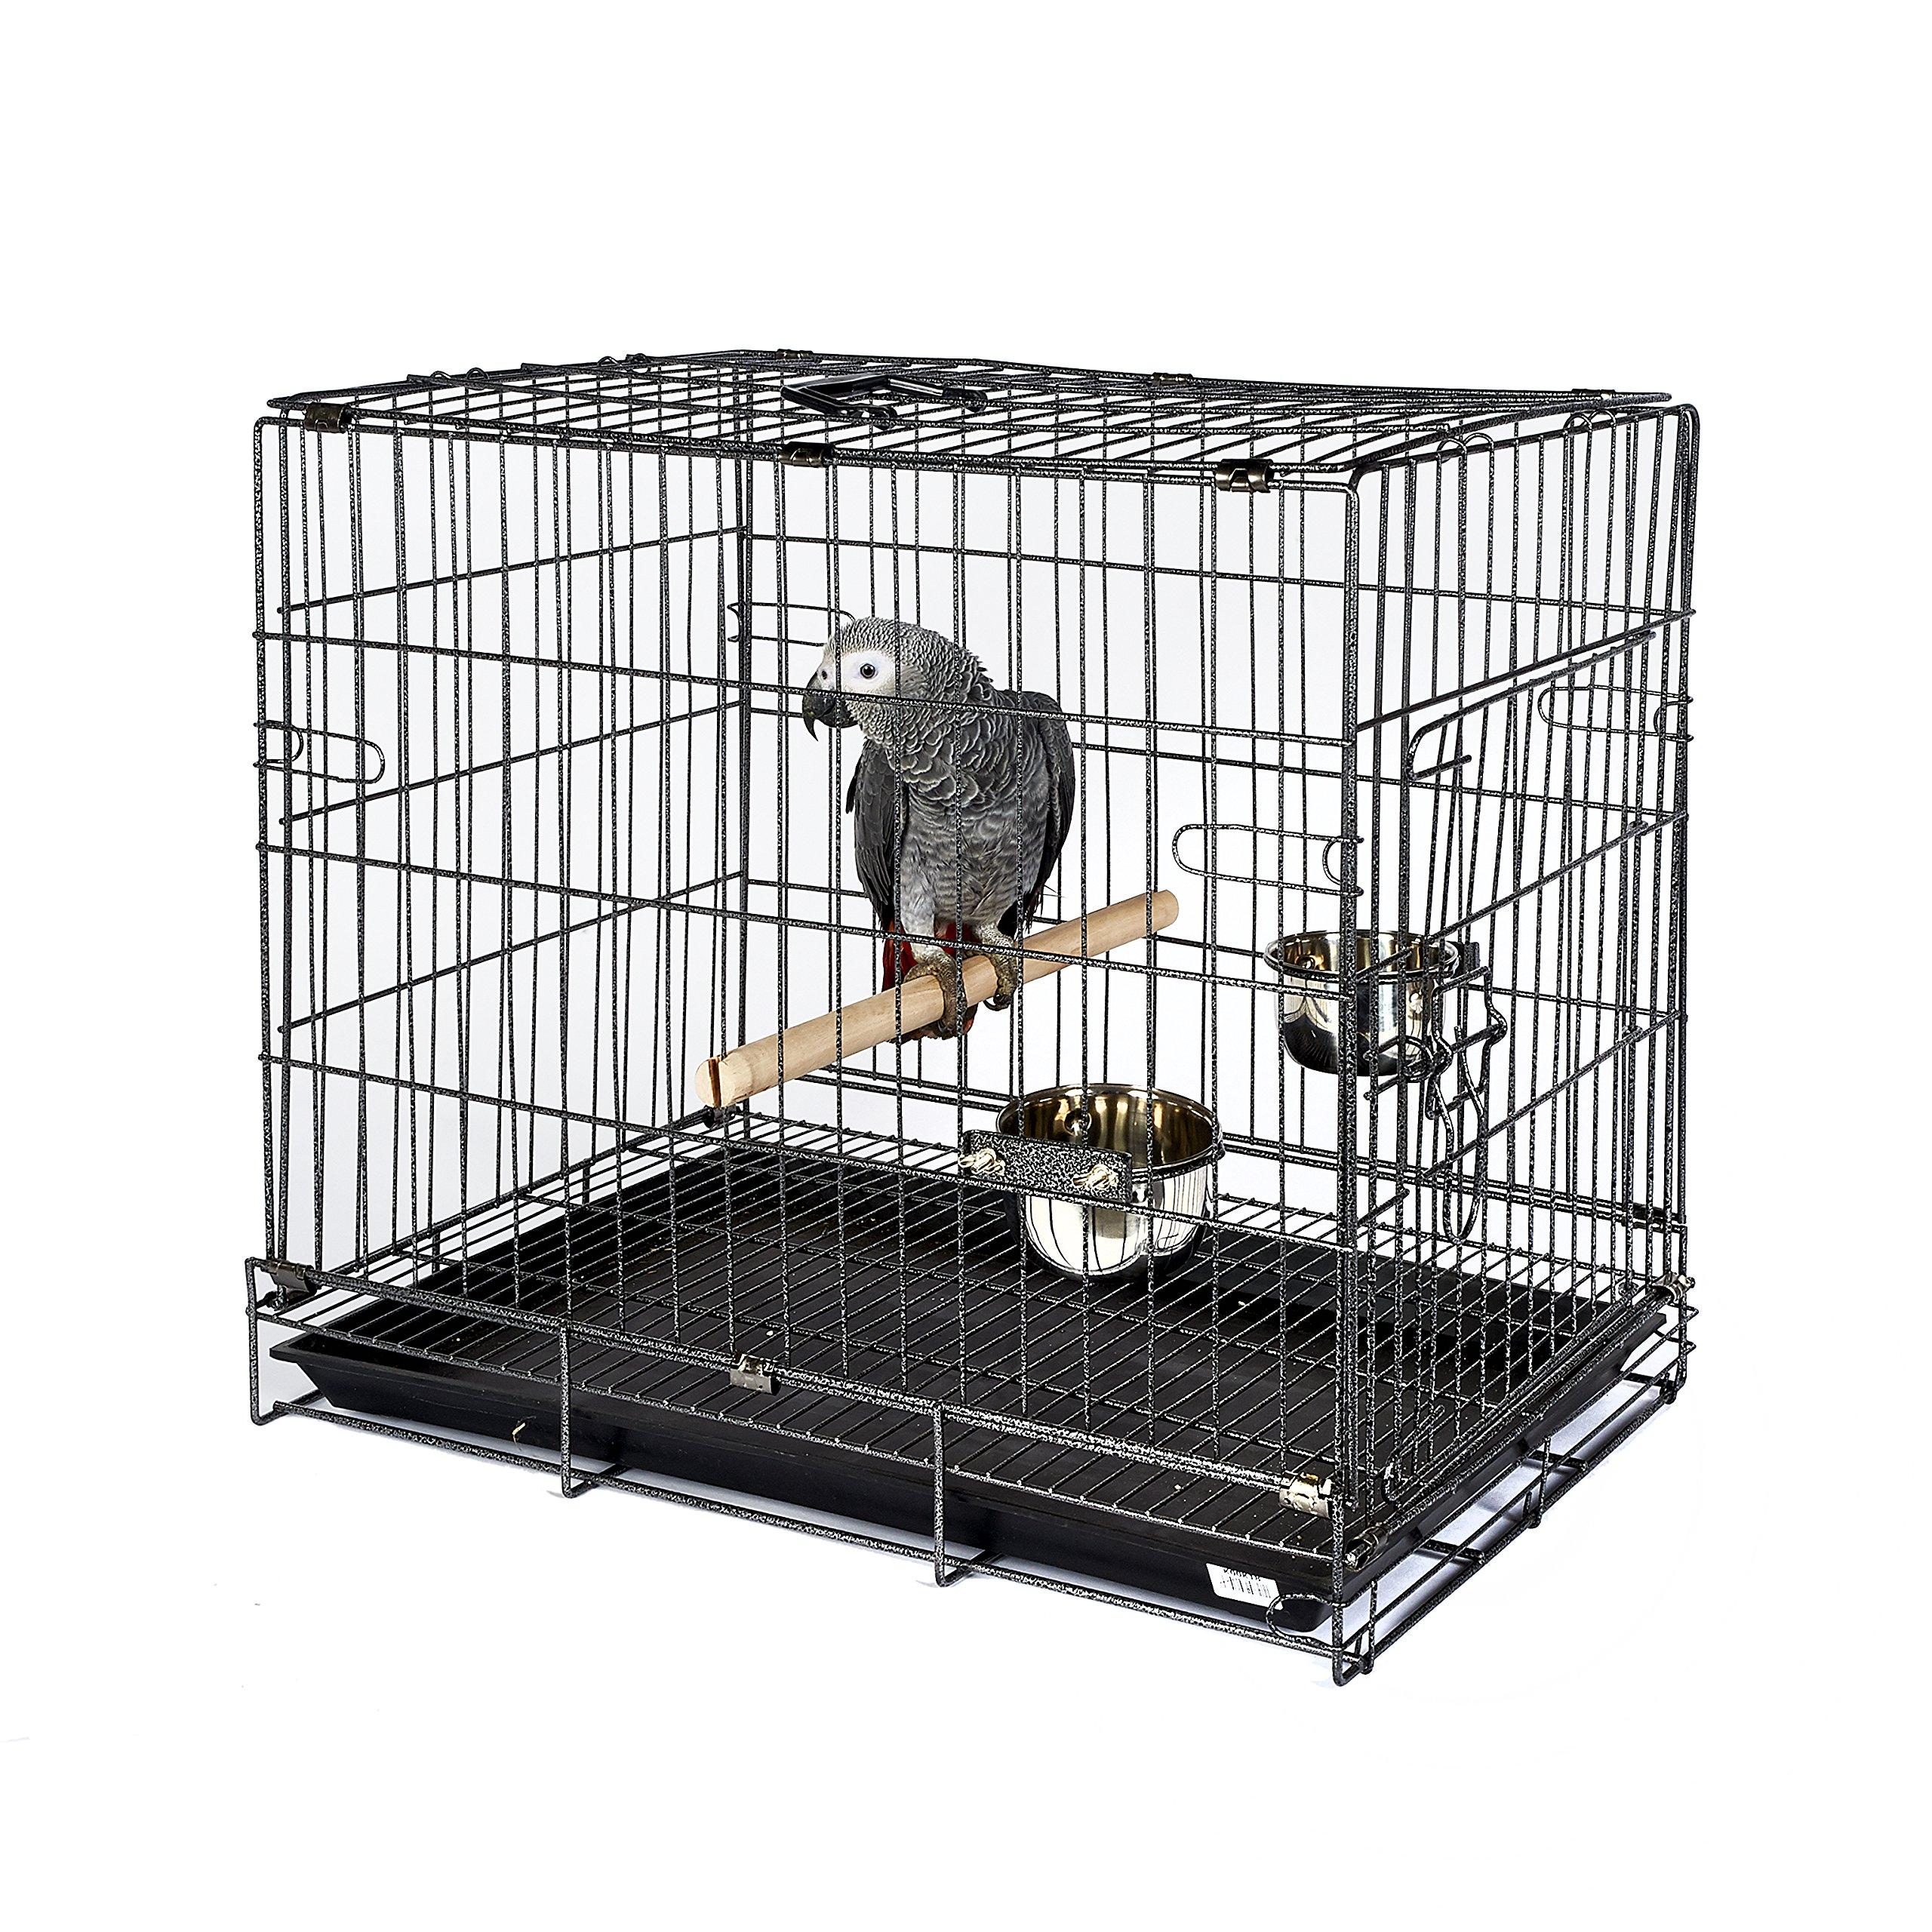 Kookaburra Cages Large Pet Carrier Cage